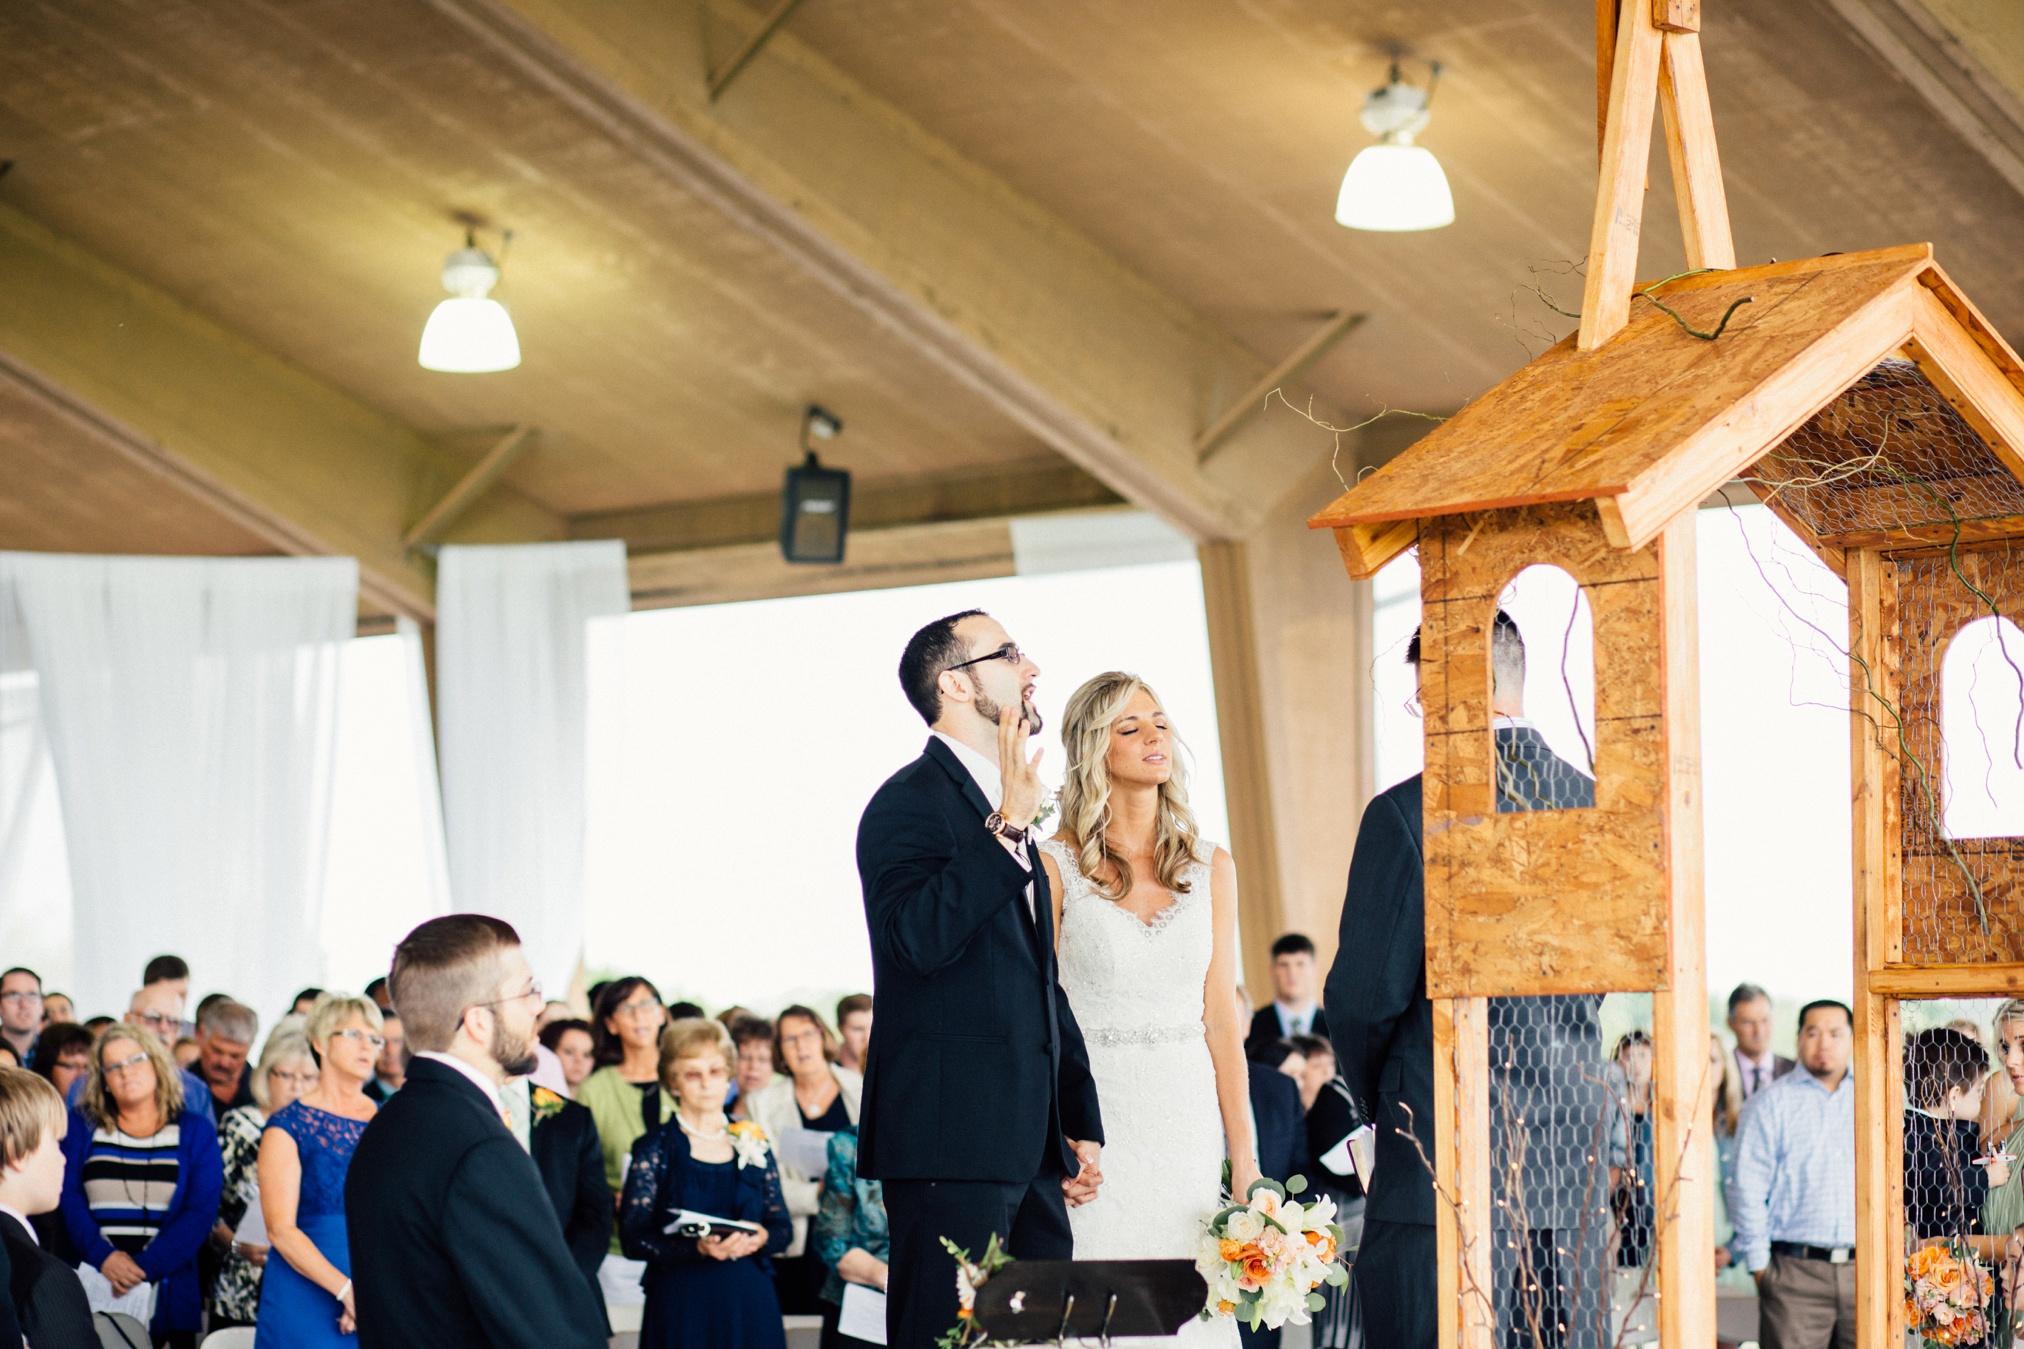 schmid_wedding-452.jpg